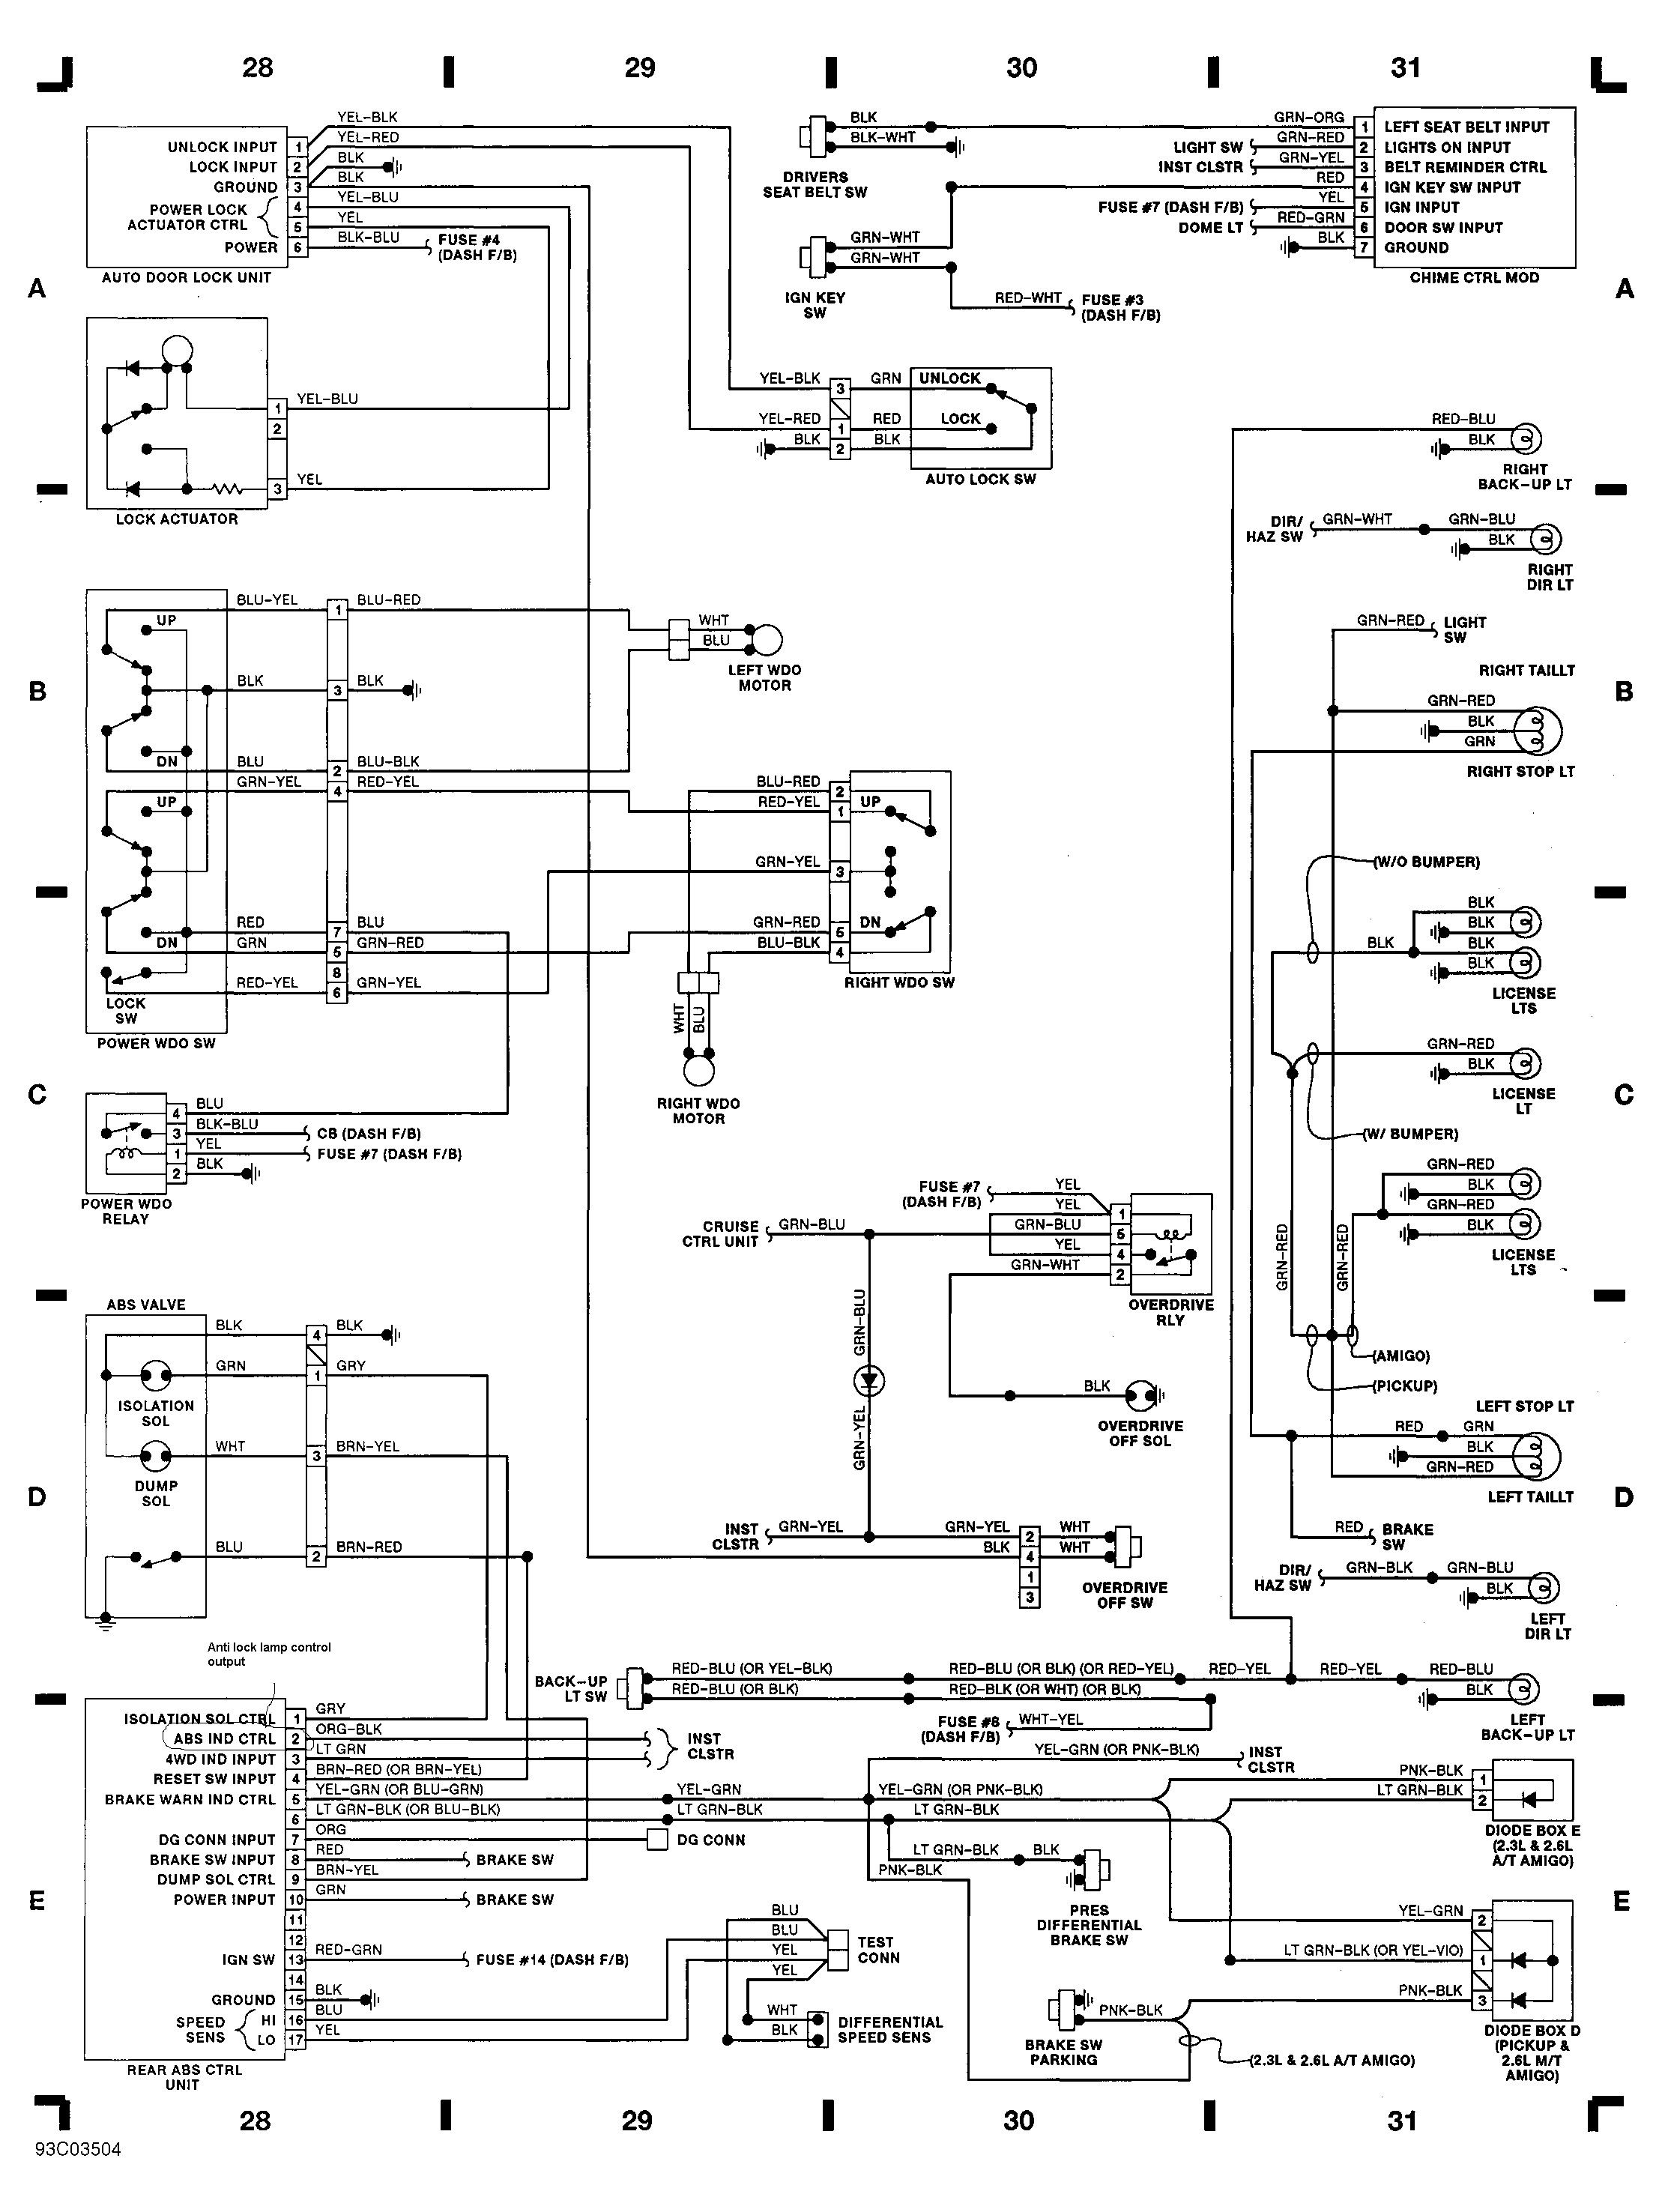 1988 Suzuki Samurai Wiring Diagram In 2021 Trailer Wiring Diagram Electrical Wiring Diagram Electrical Diagram